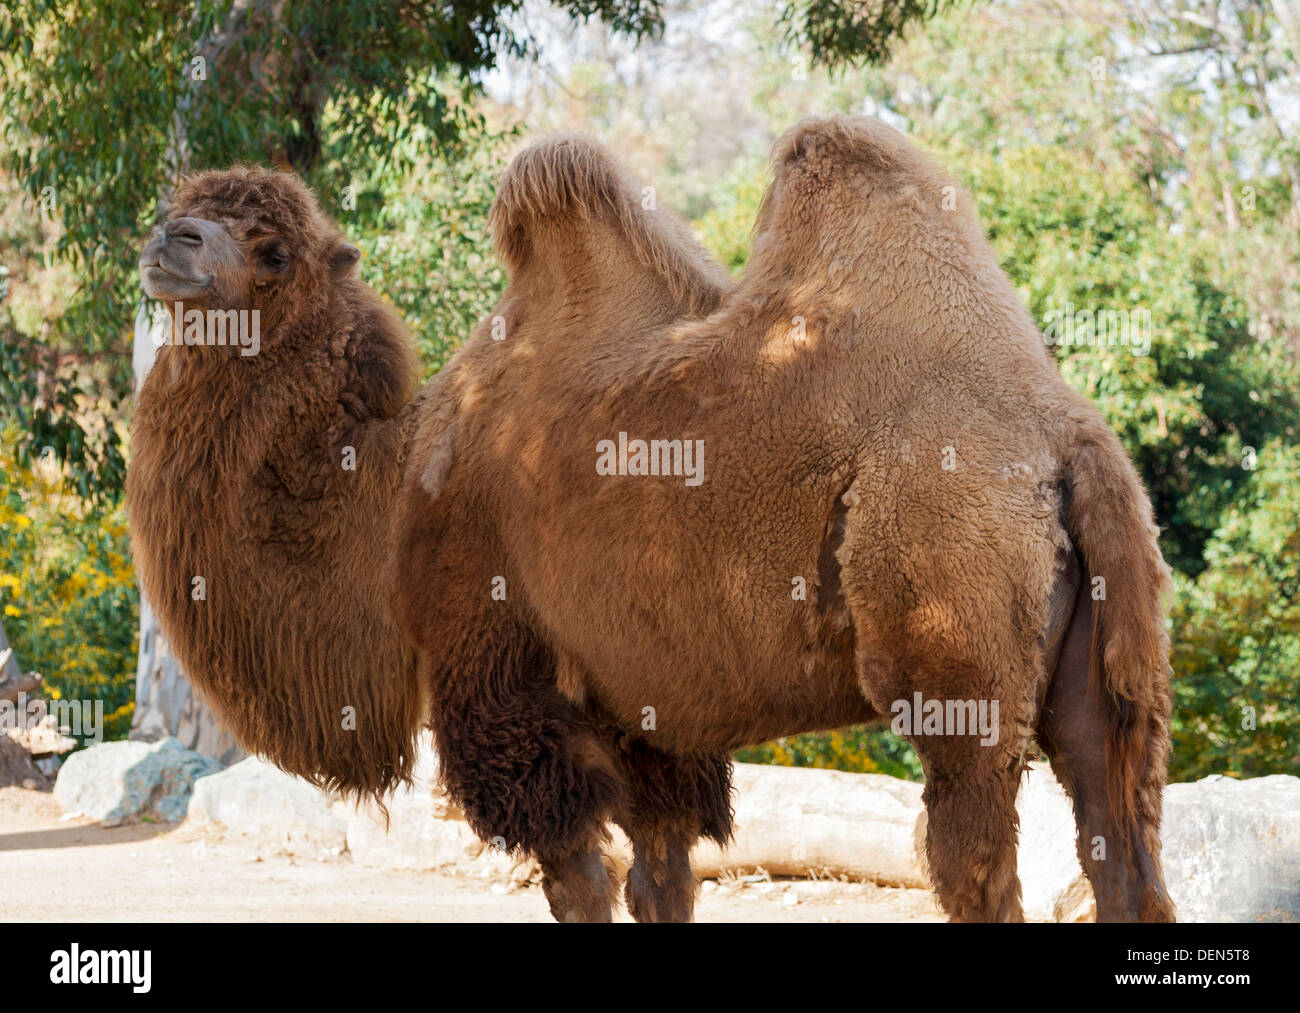 California, San Diego Zoo, two hump Bactrian camel (Camelus bactrianus) - Stock Image